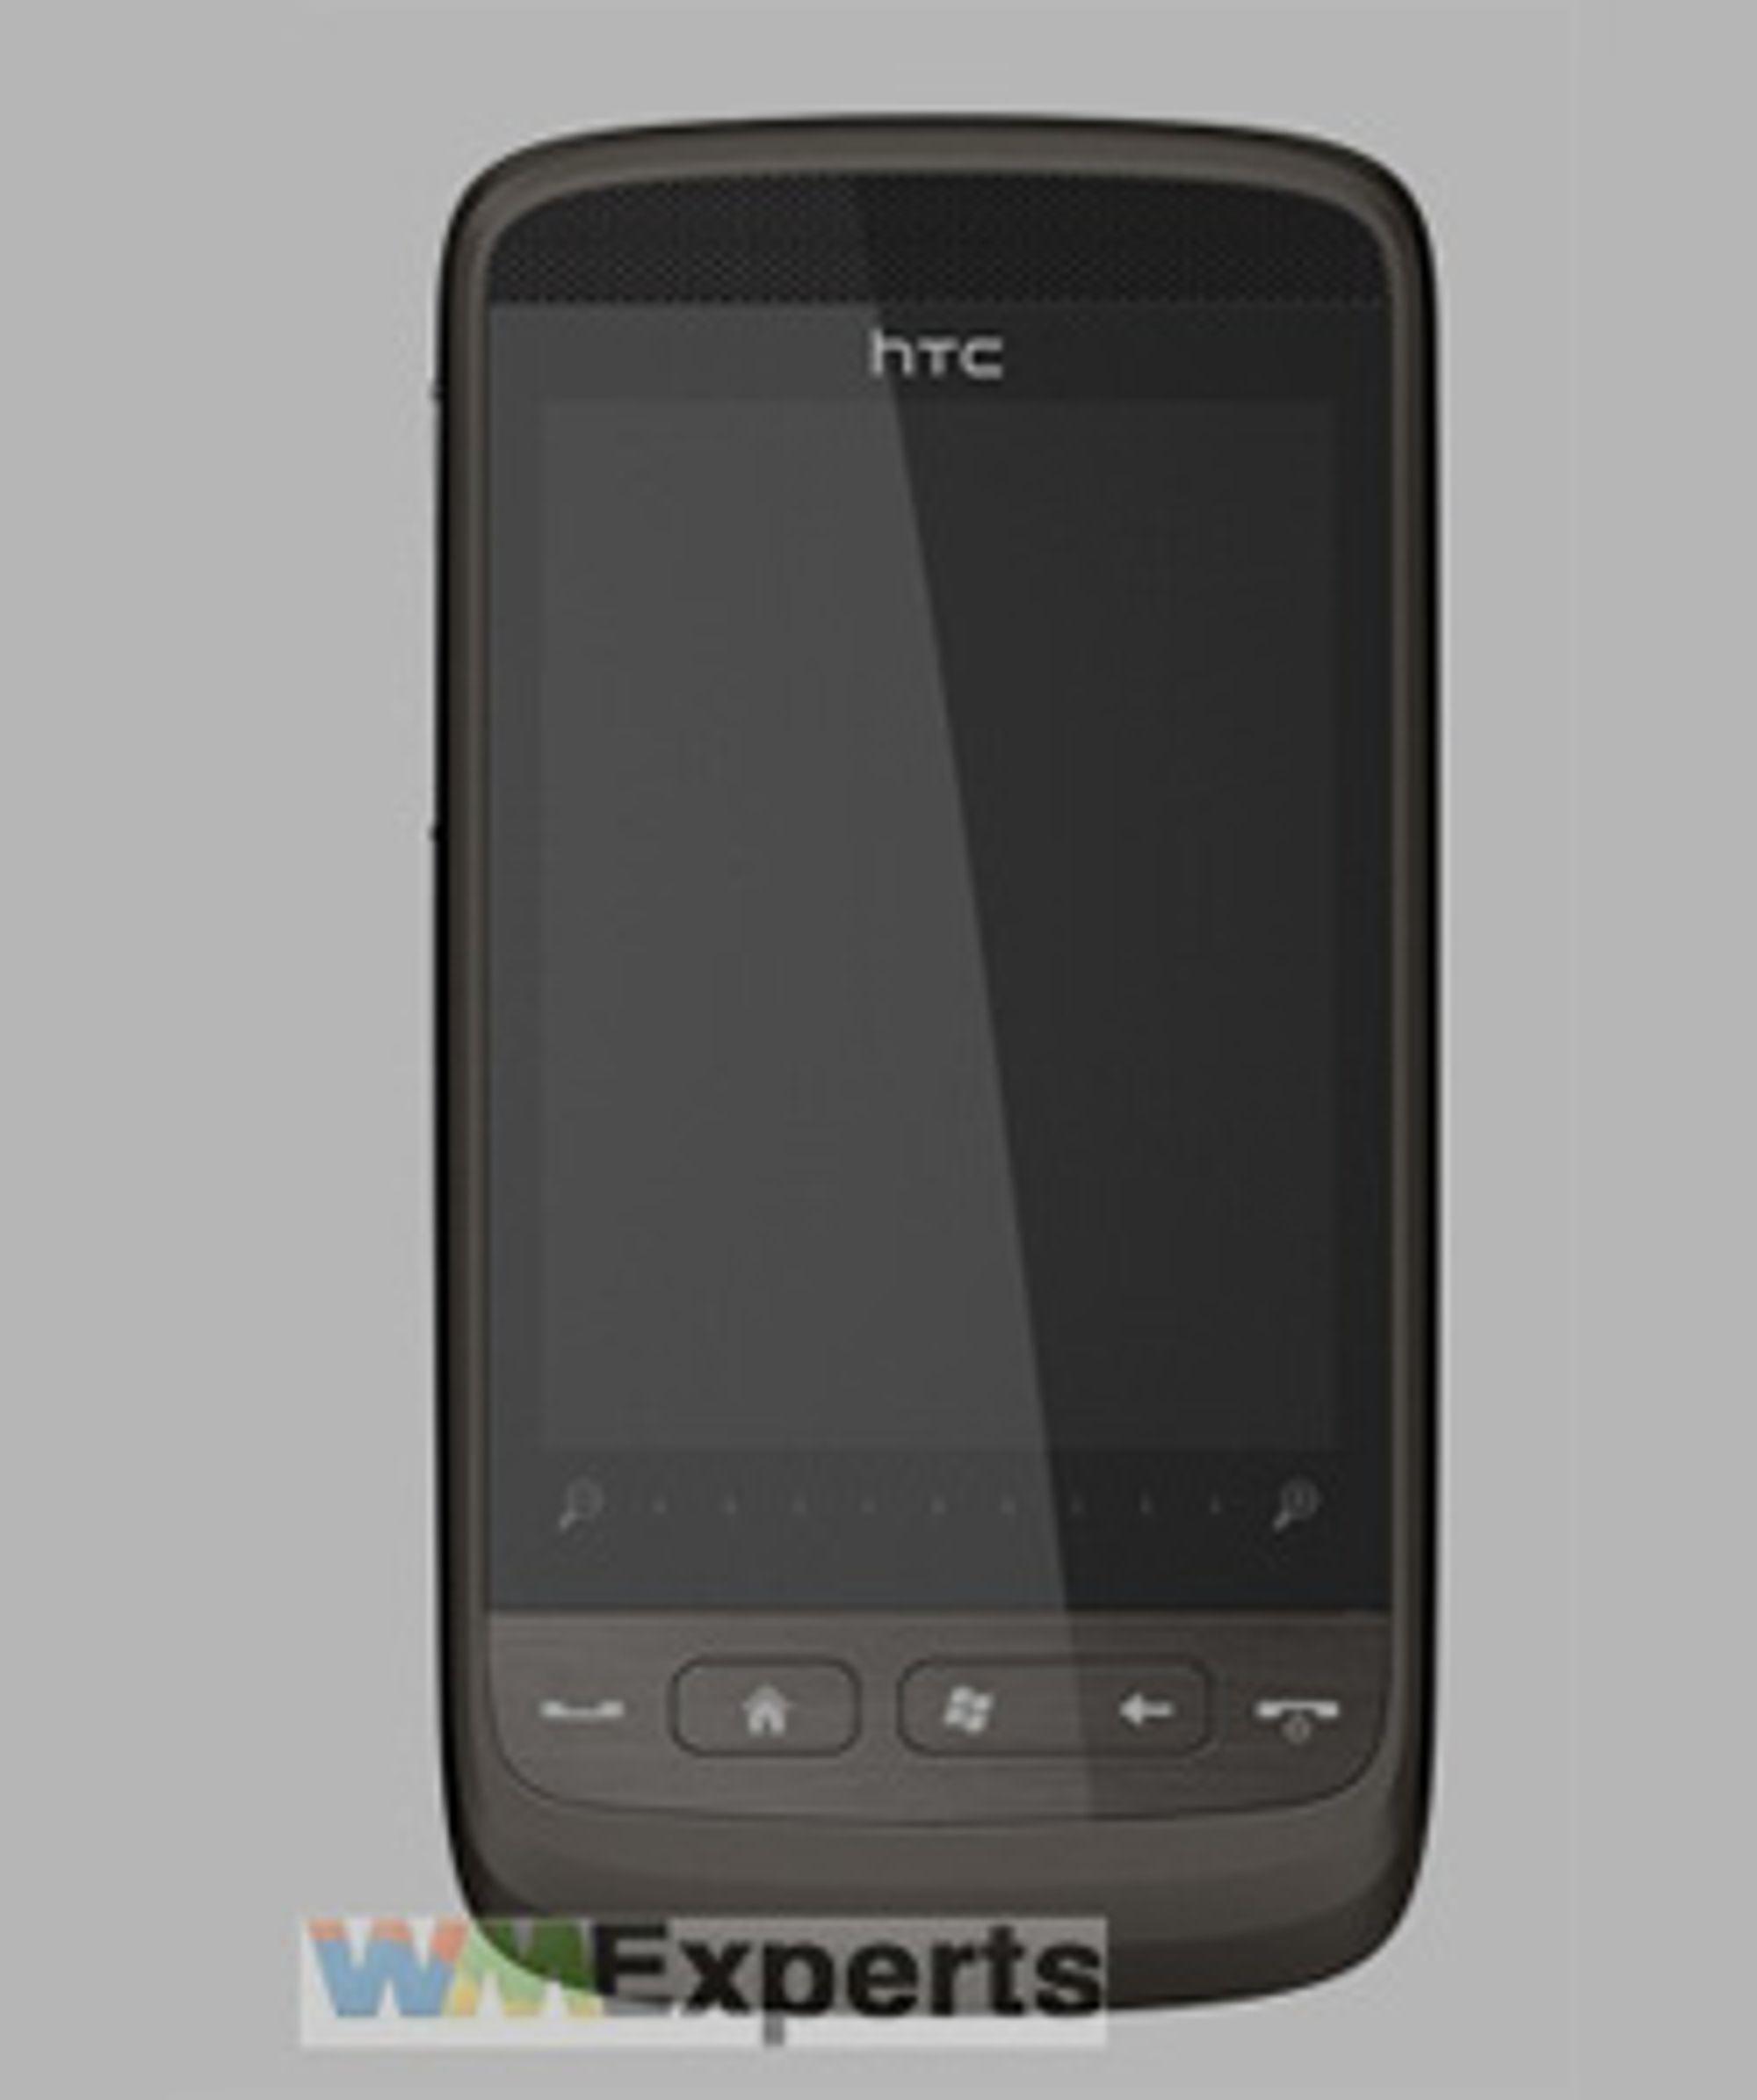 HTC Mega. (Foto: WM Experts)